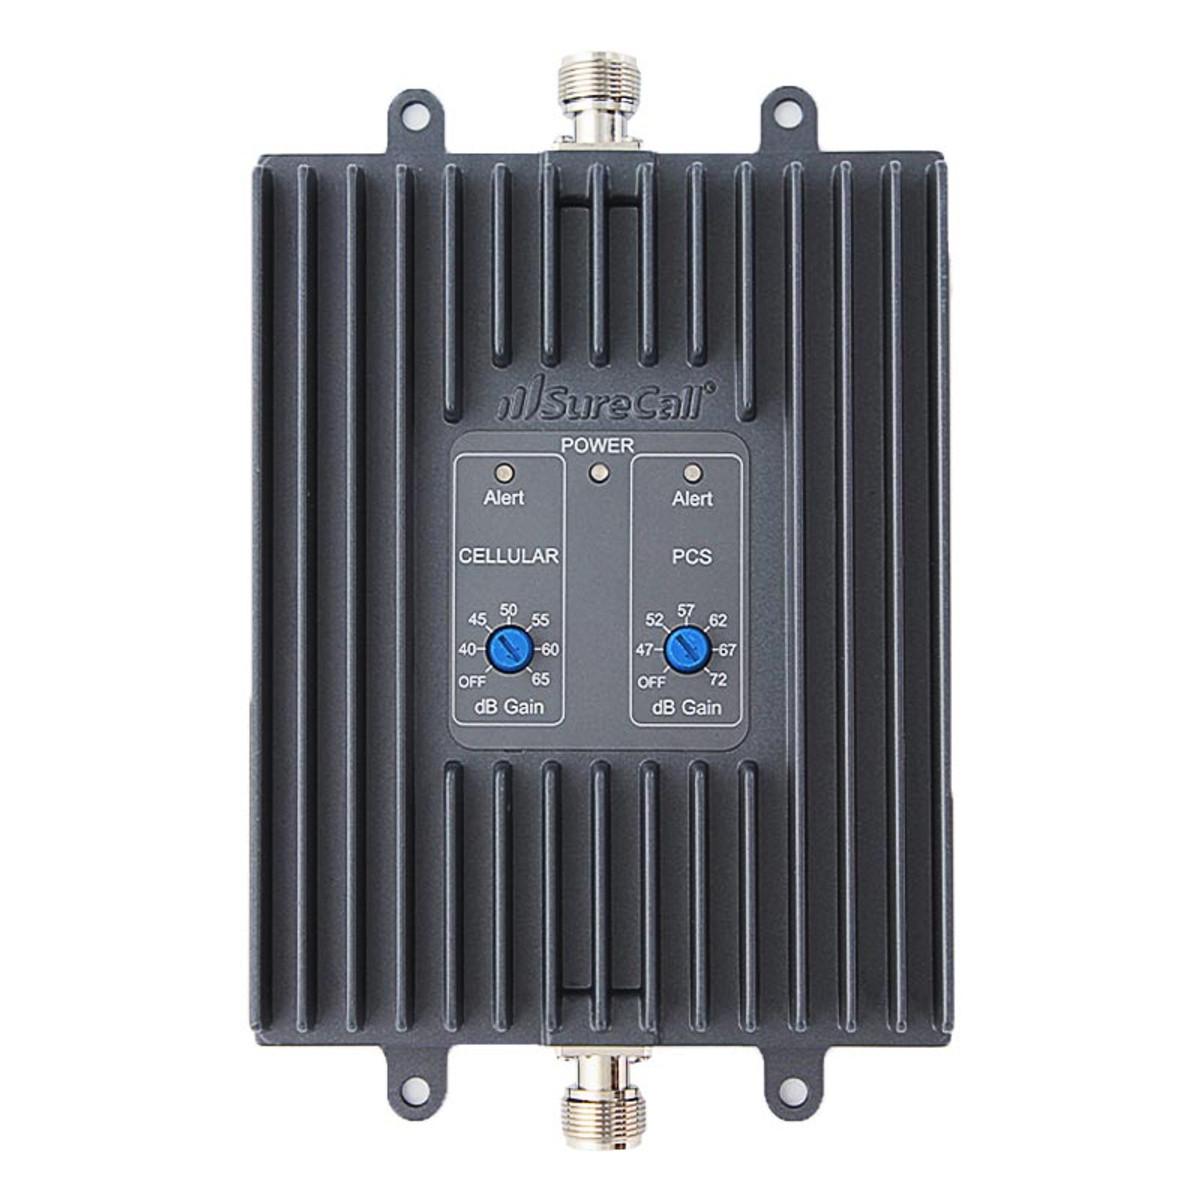 SureCall FlexPro 3G Signal Booster with Yagi & Whip Antennas | Amp